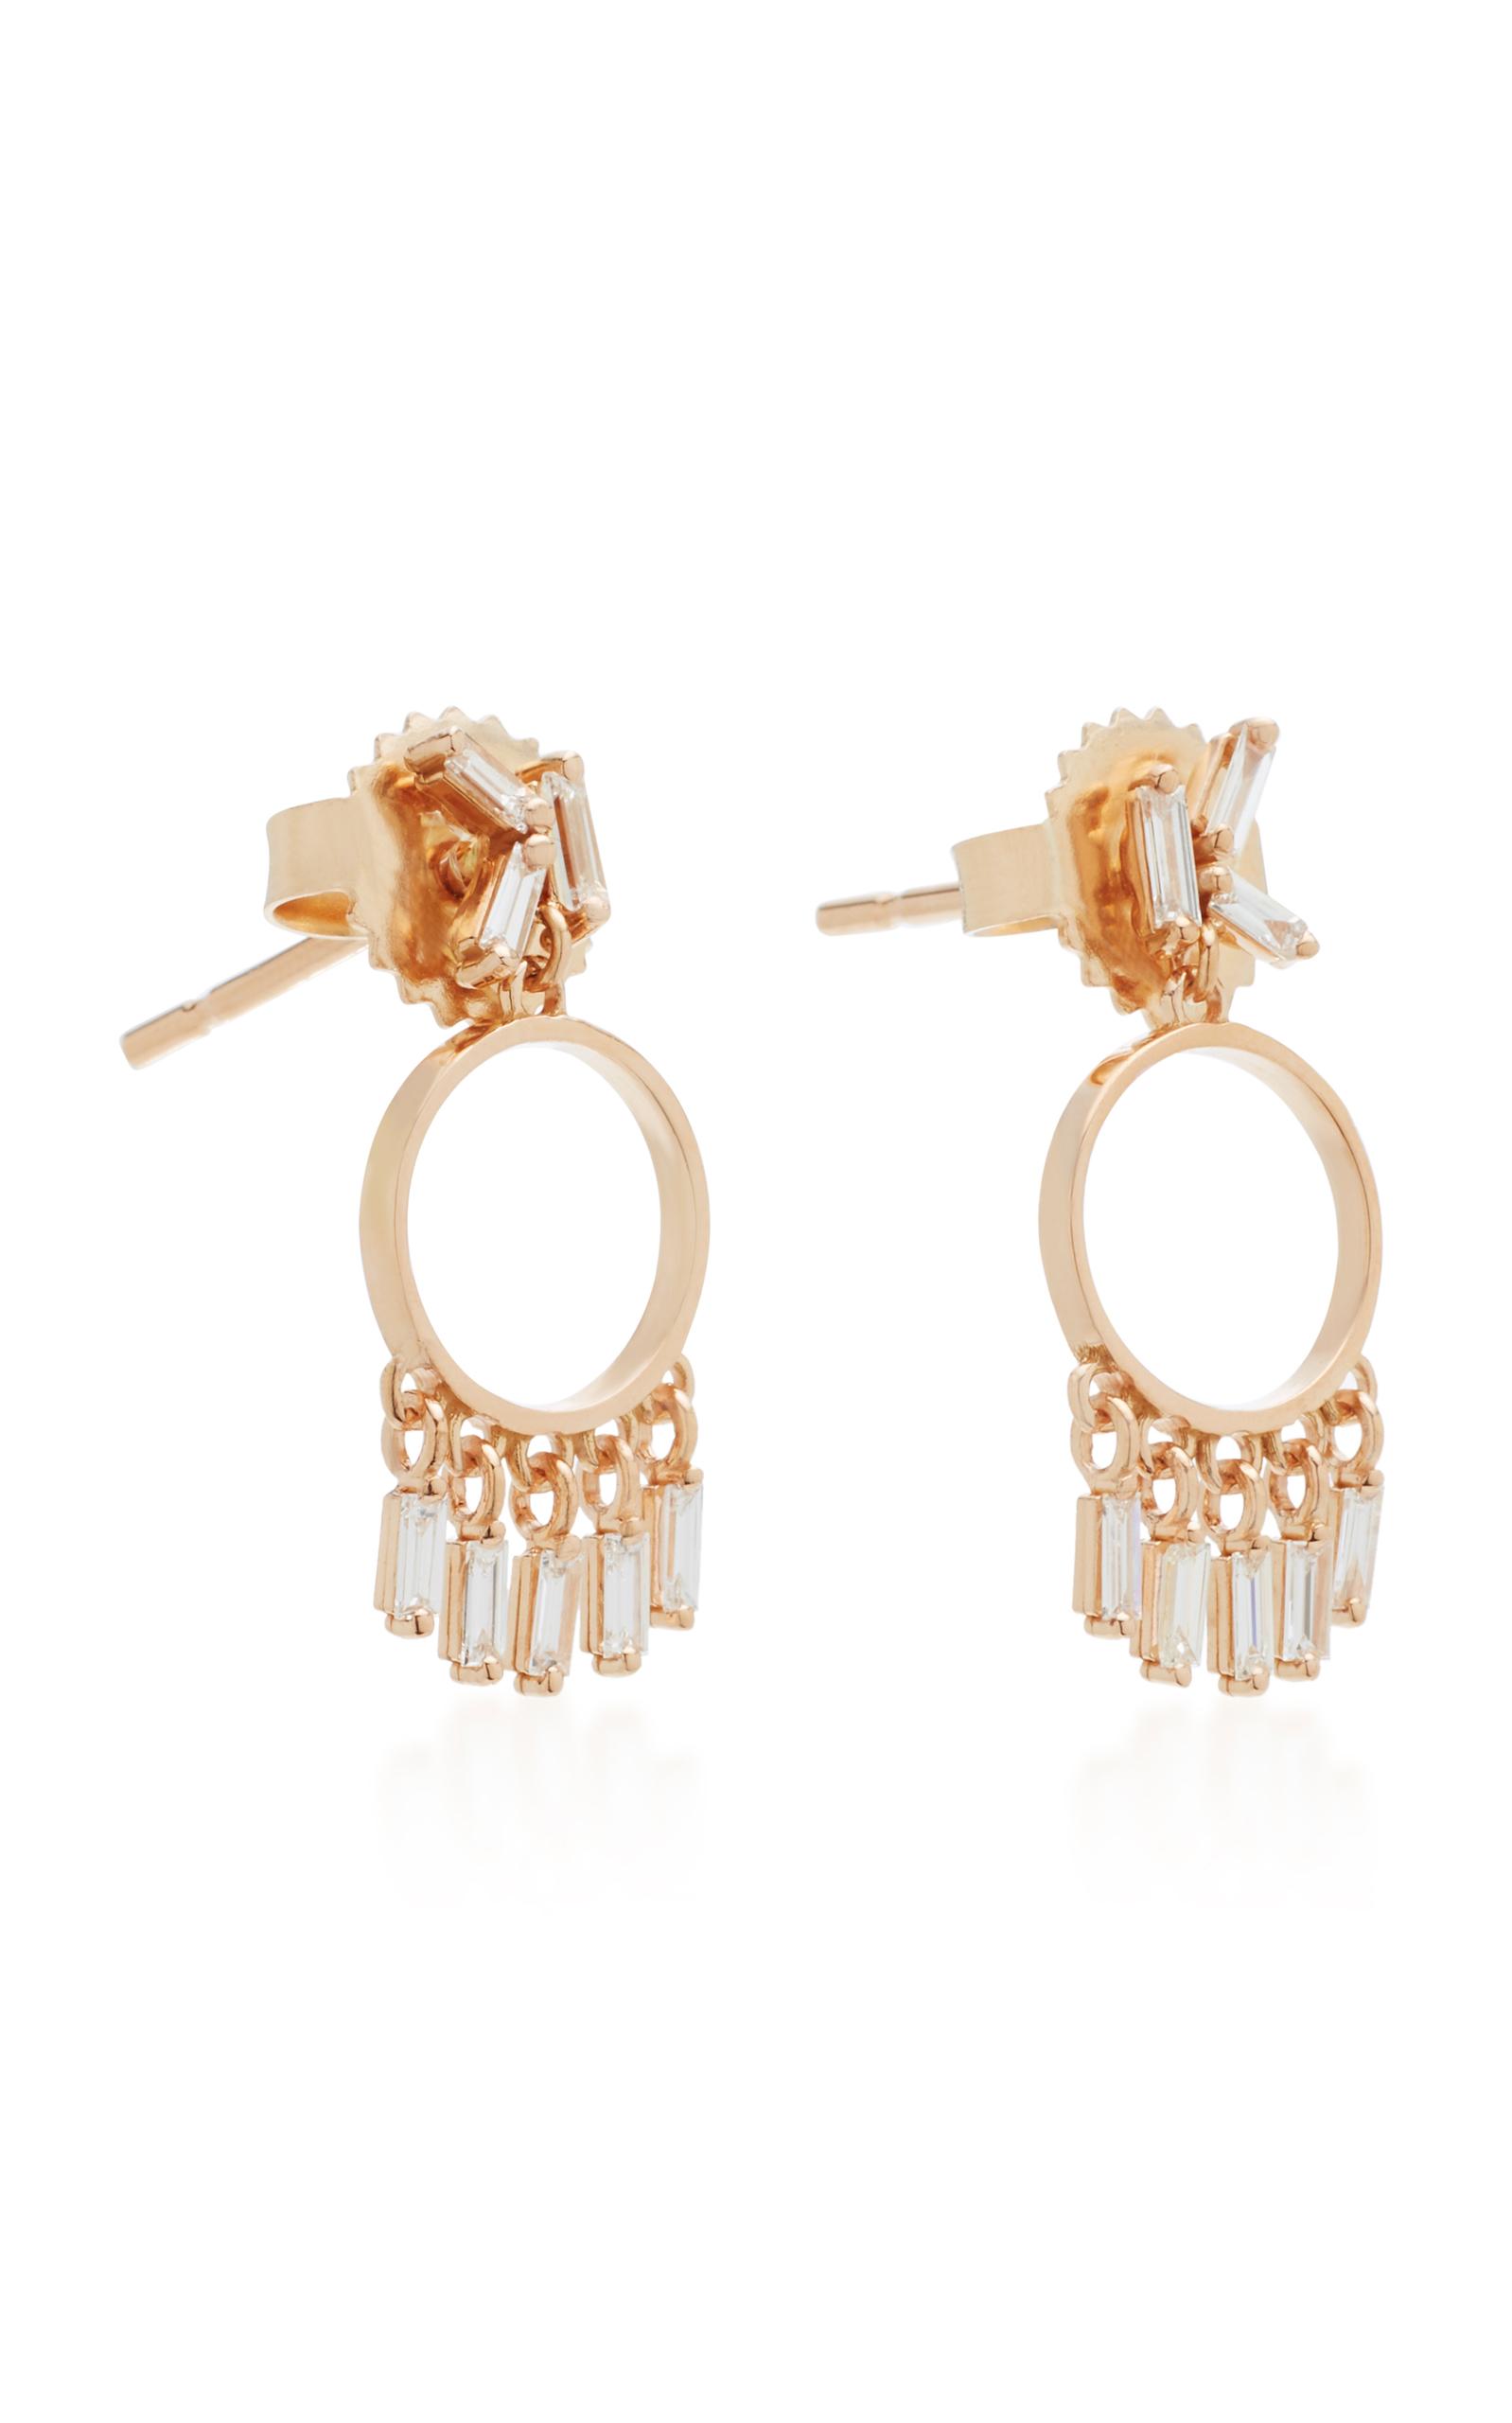 Suzanne Kalan 18k Rose Gold Baguette Diamond Hoop Earrings 53gvvPkt0